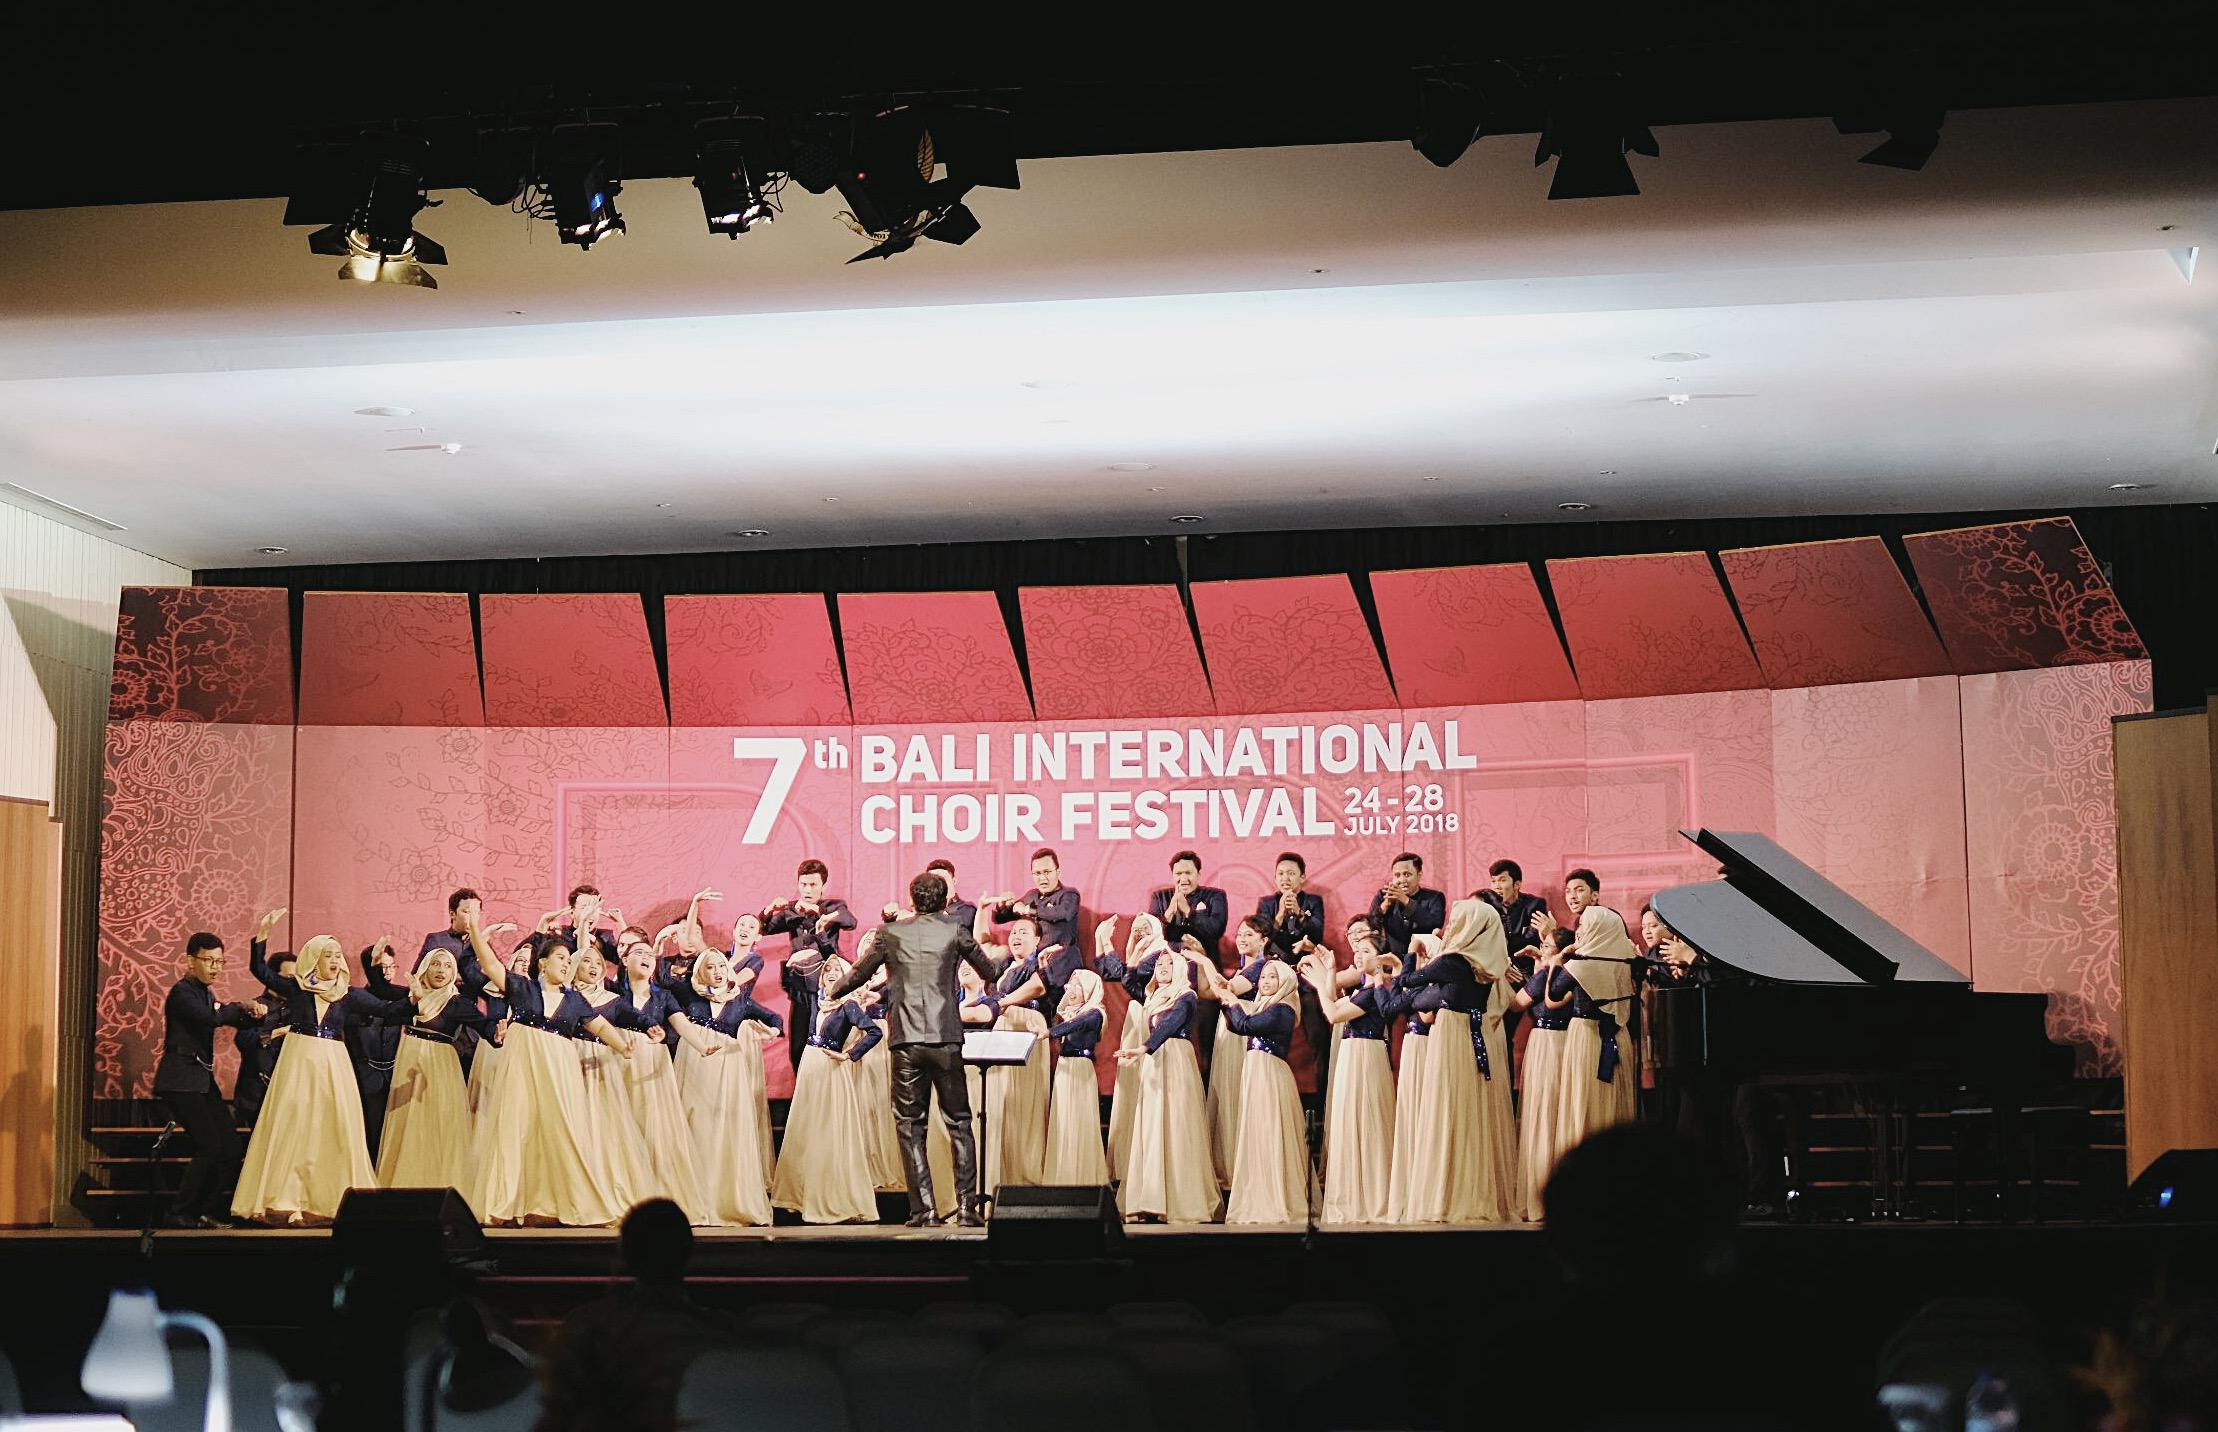 Penampilan PSM Unpad dalam Grand Prix 7th Bali International Choir Festival 2018